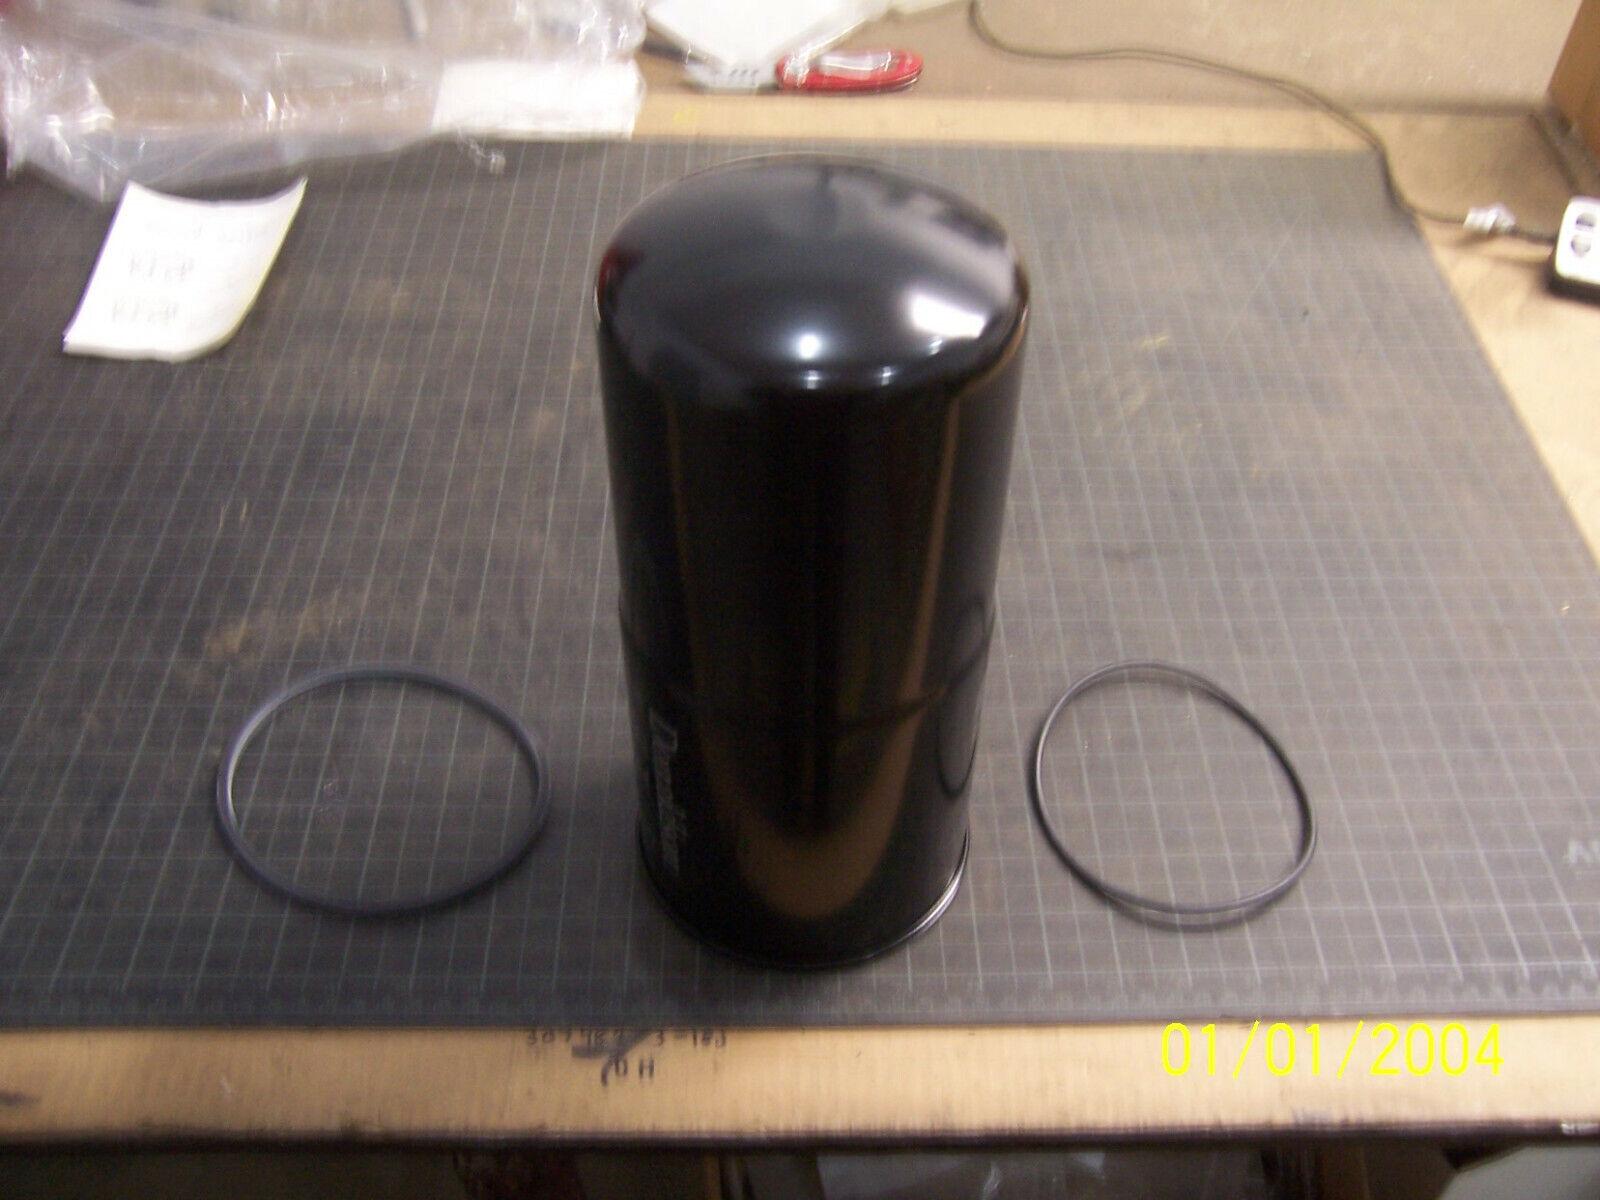 P550416 Donaldson HYD FILTER x HF6317 BT739